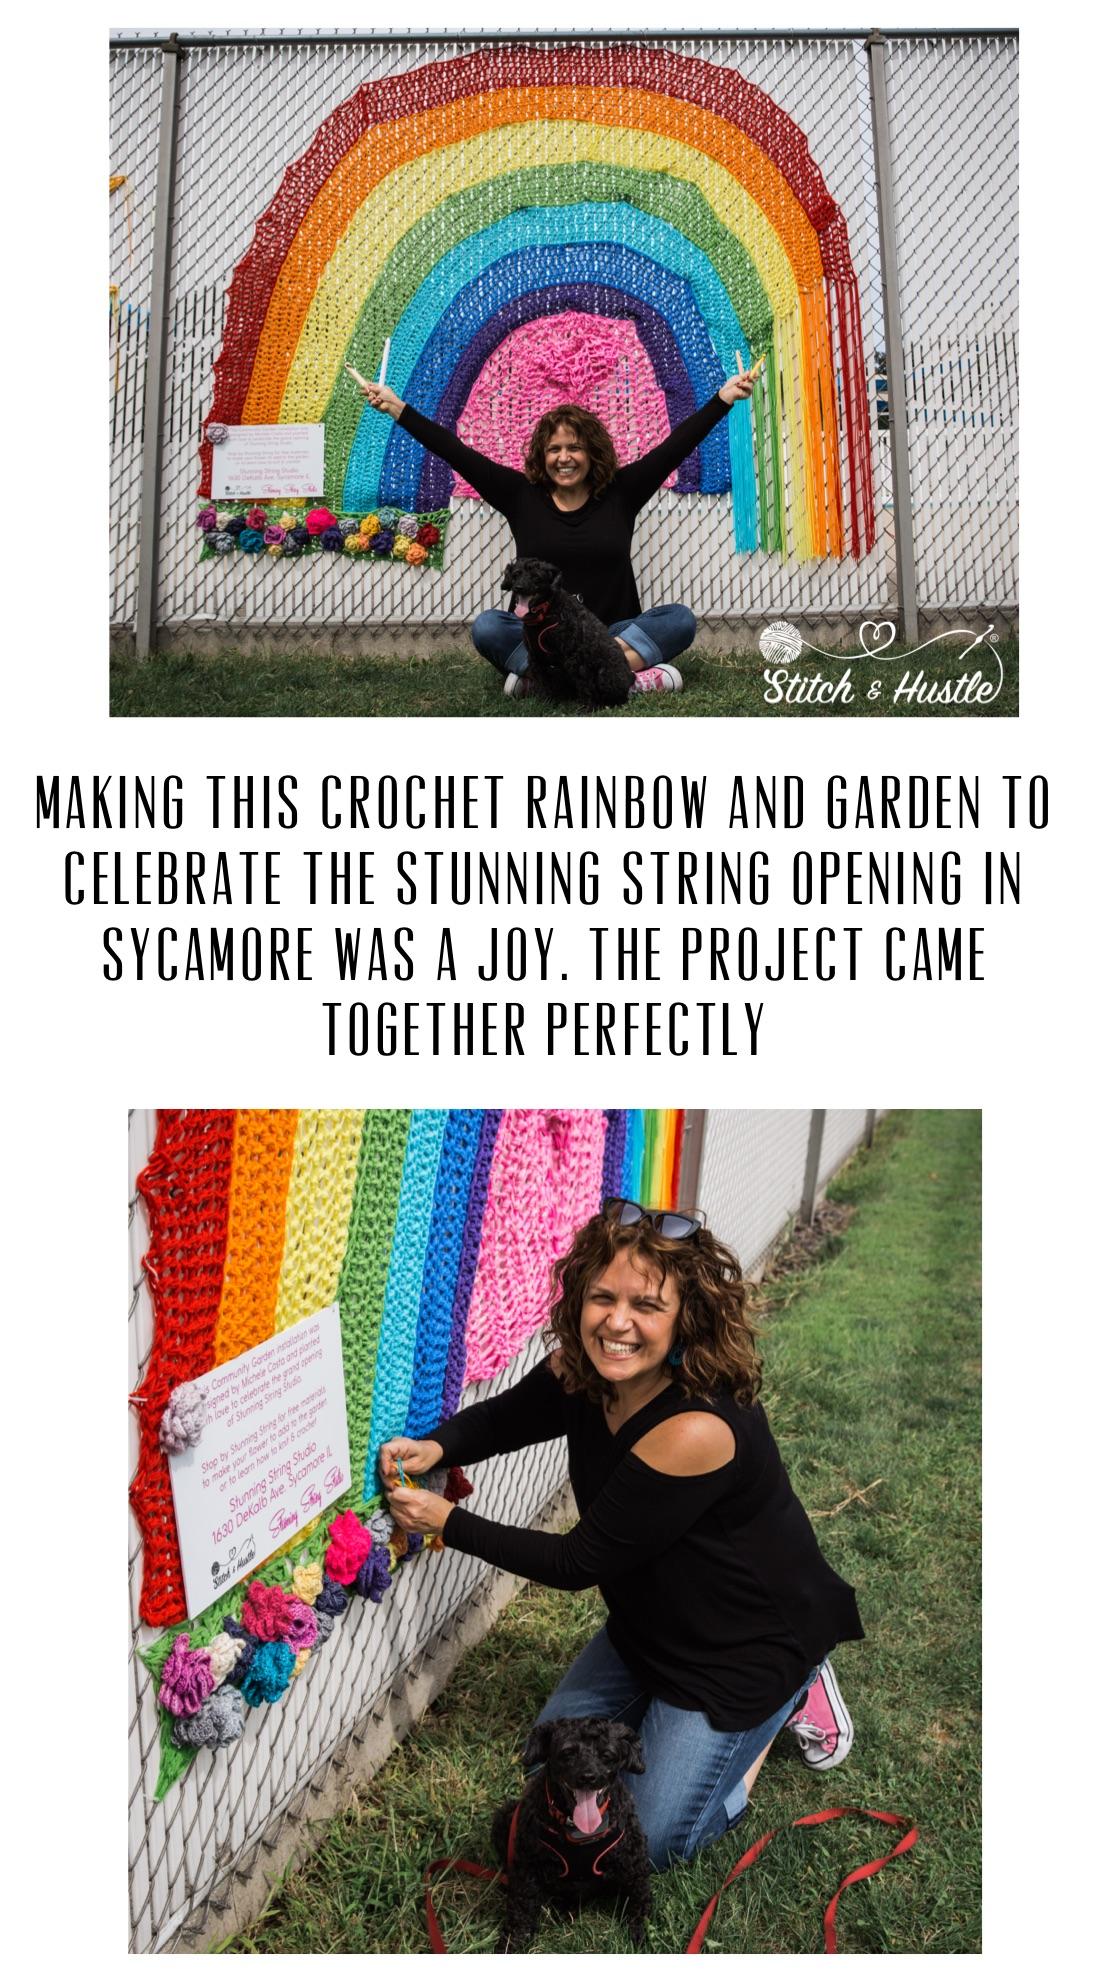 Stunning_string-rainbow-crochet-yarn-bomb-6.jpg